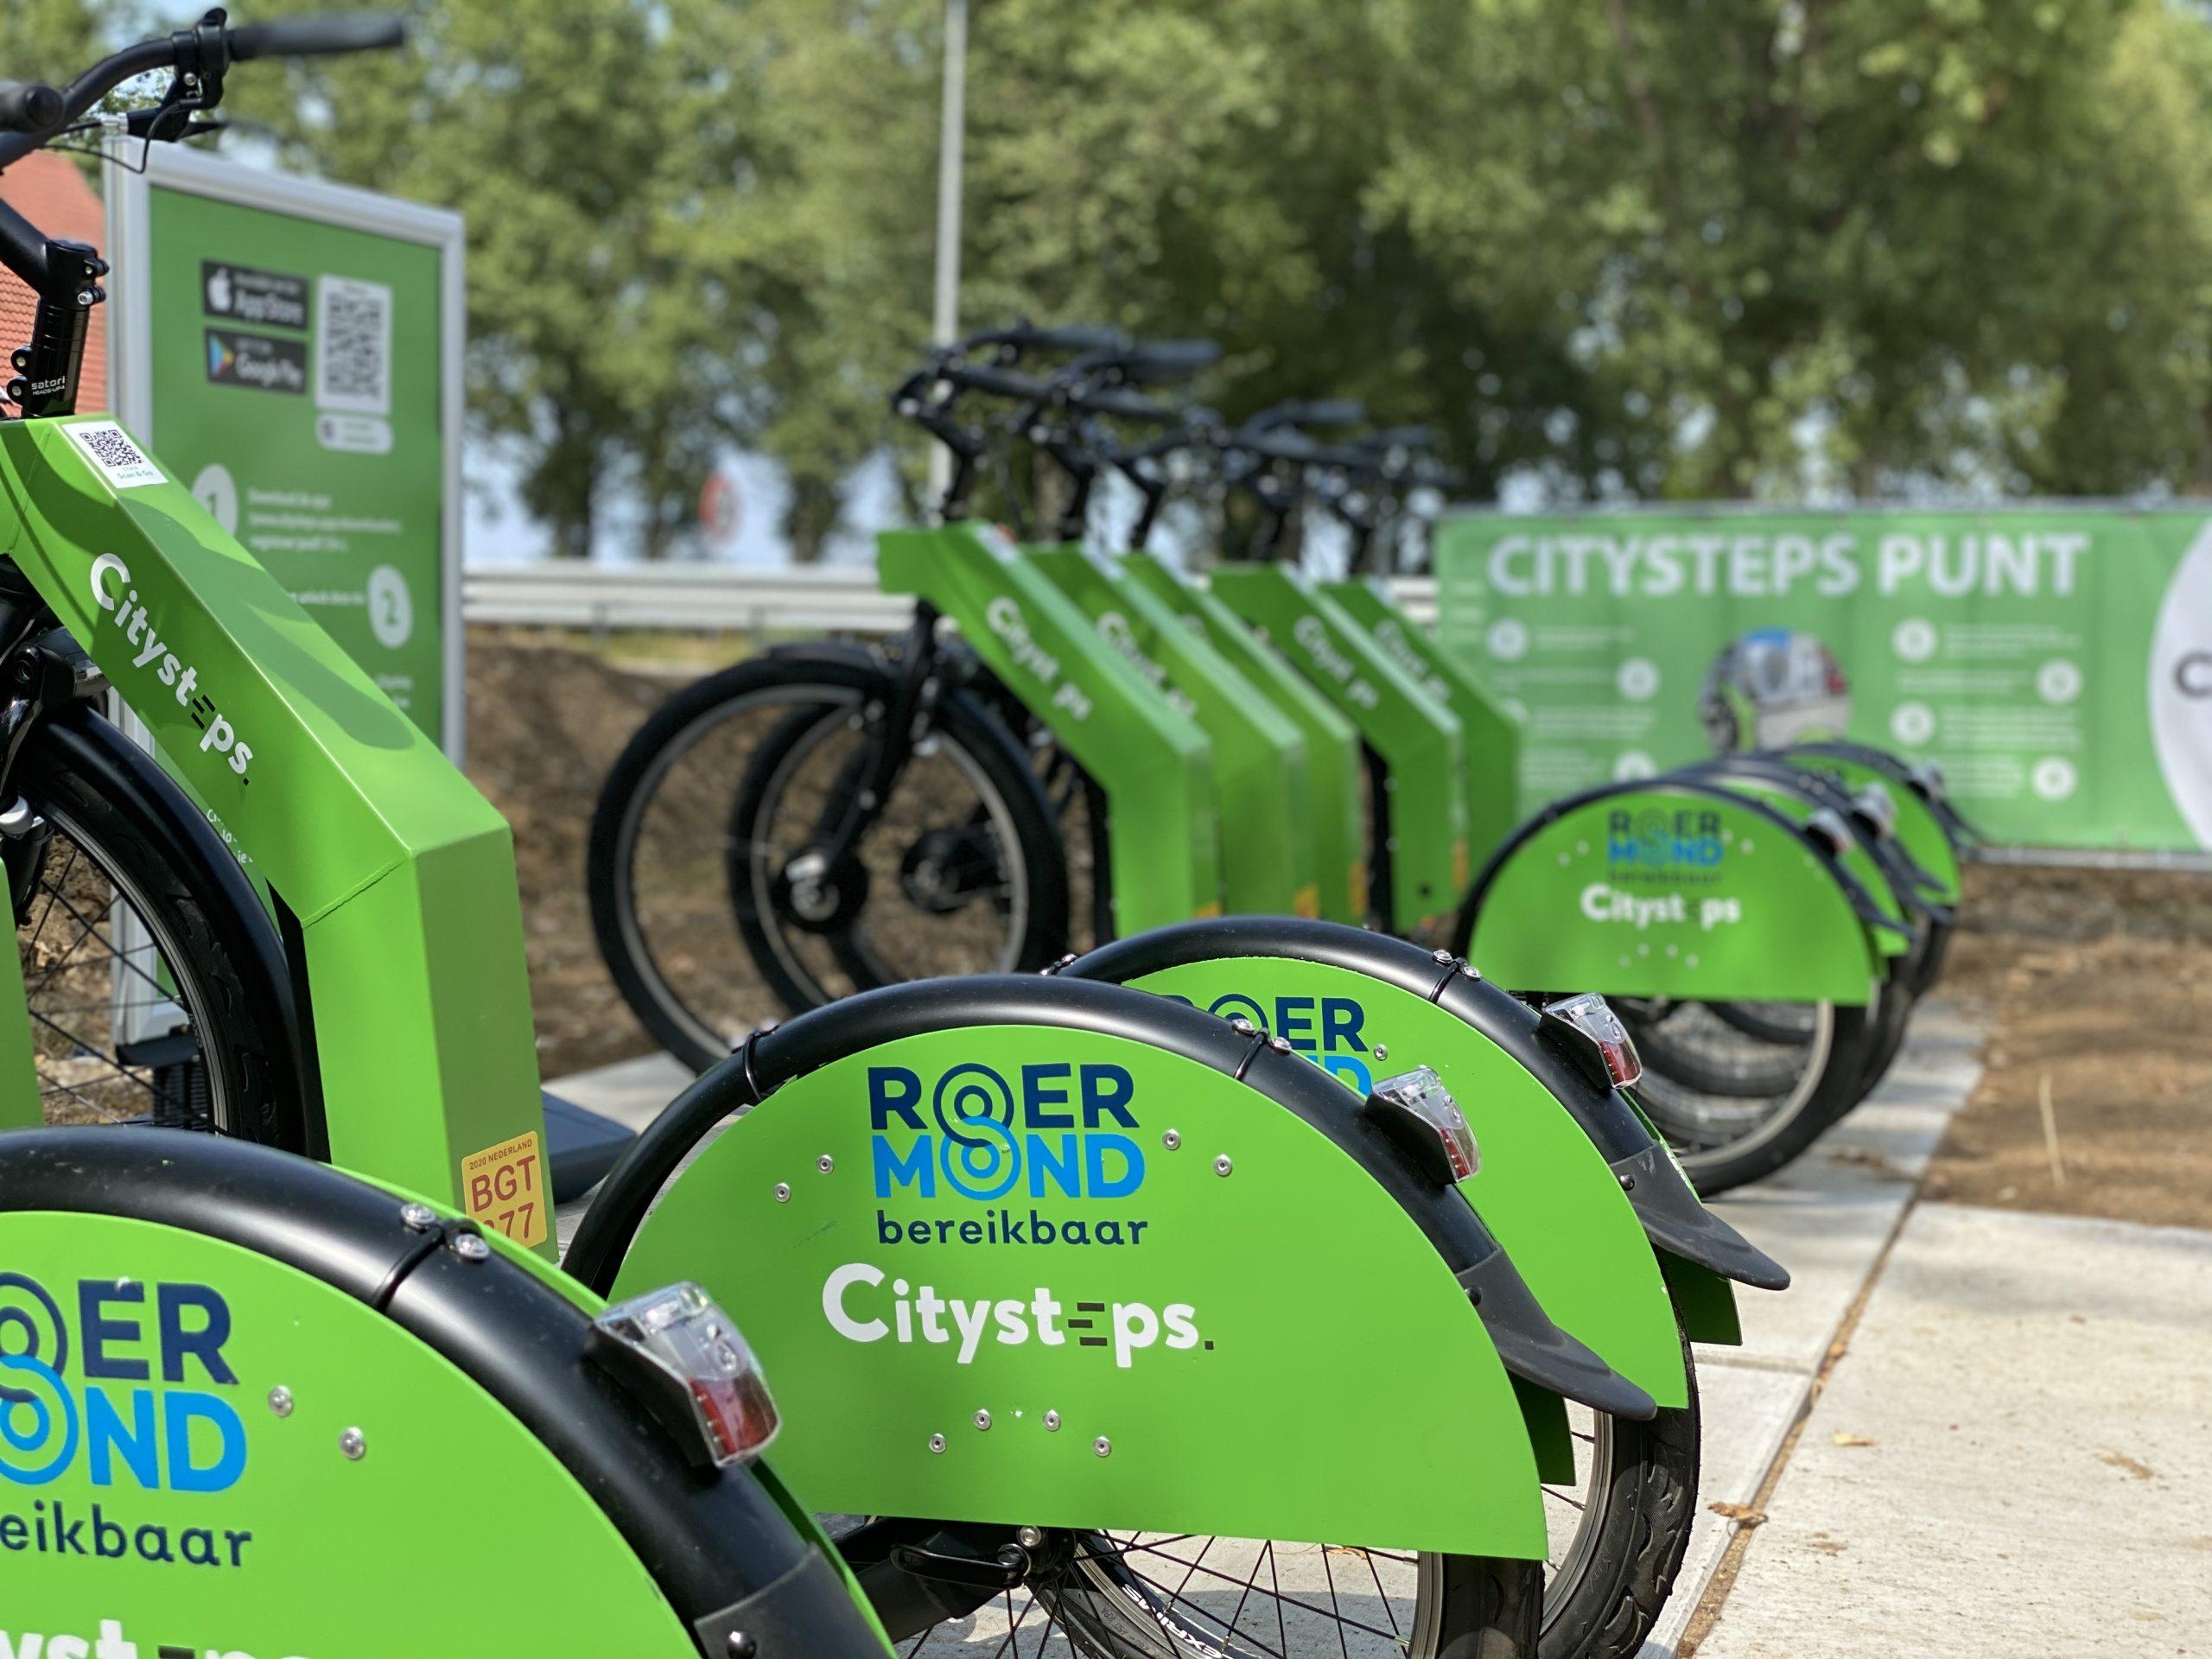 Roermond Citysteps